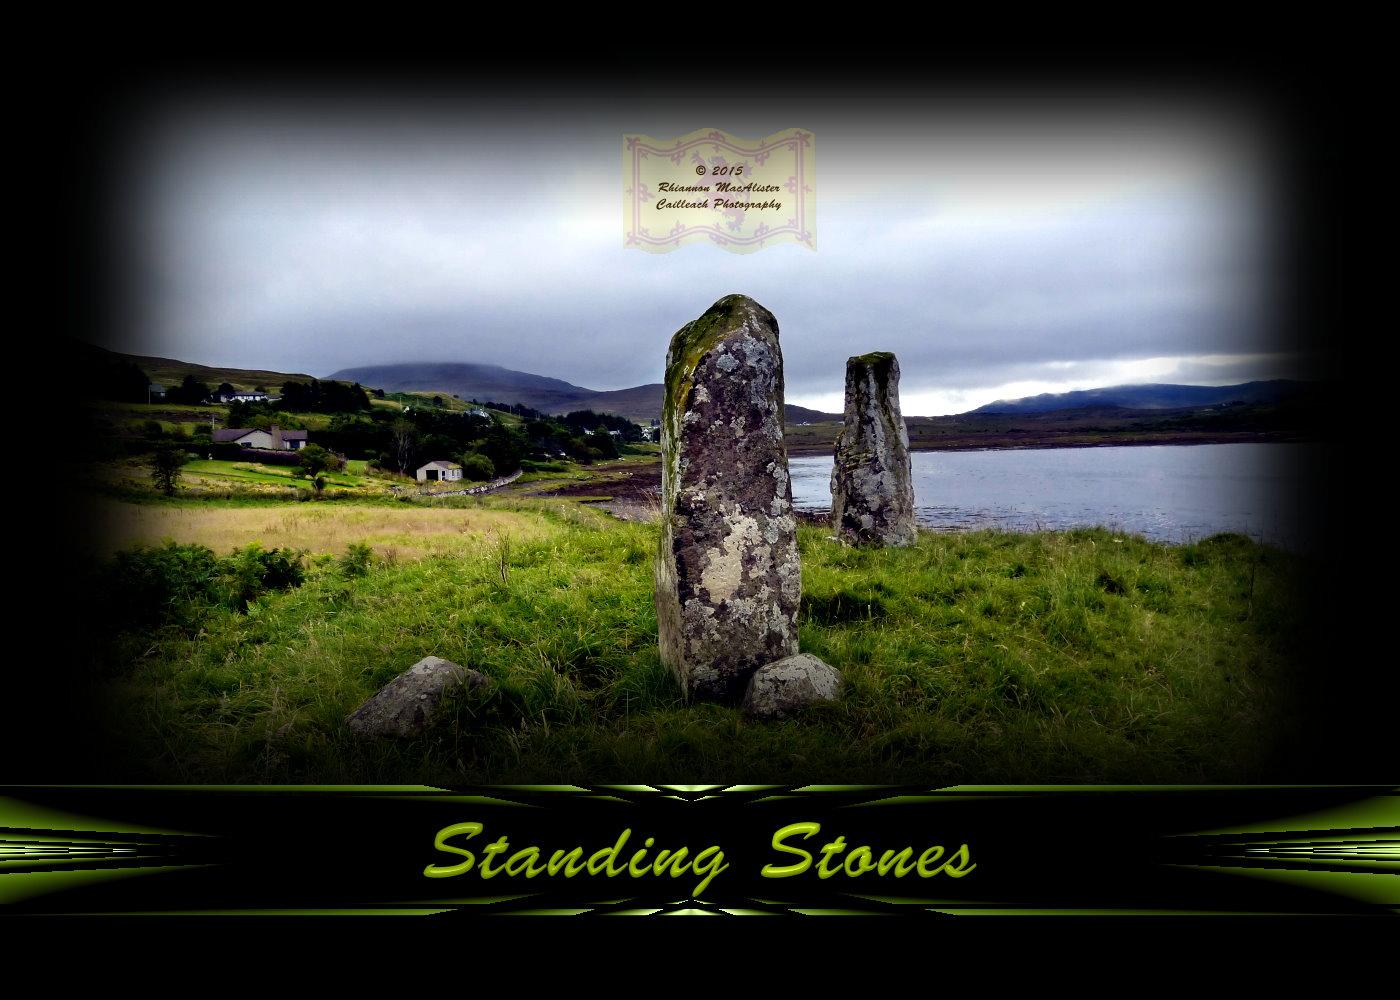 Standing Stones of Kensalyre